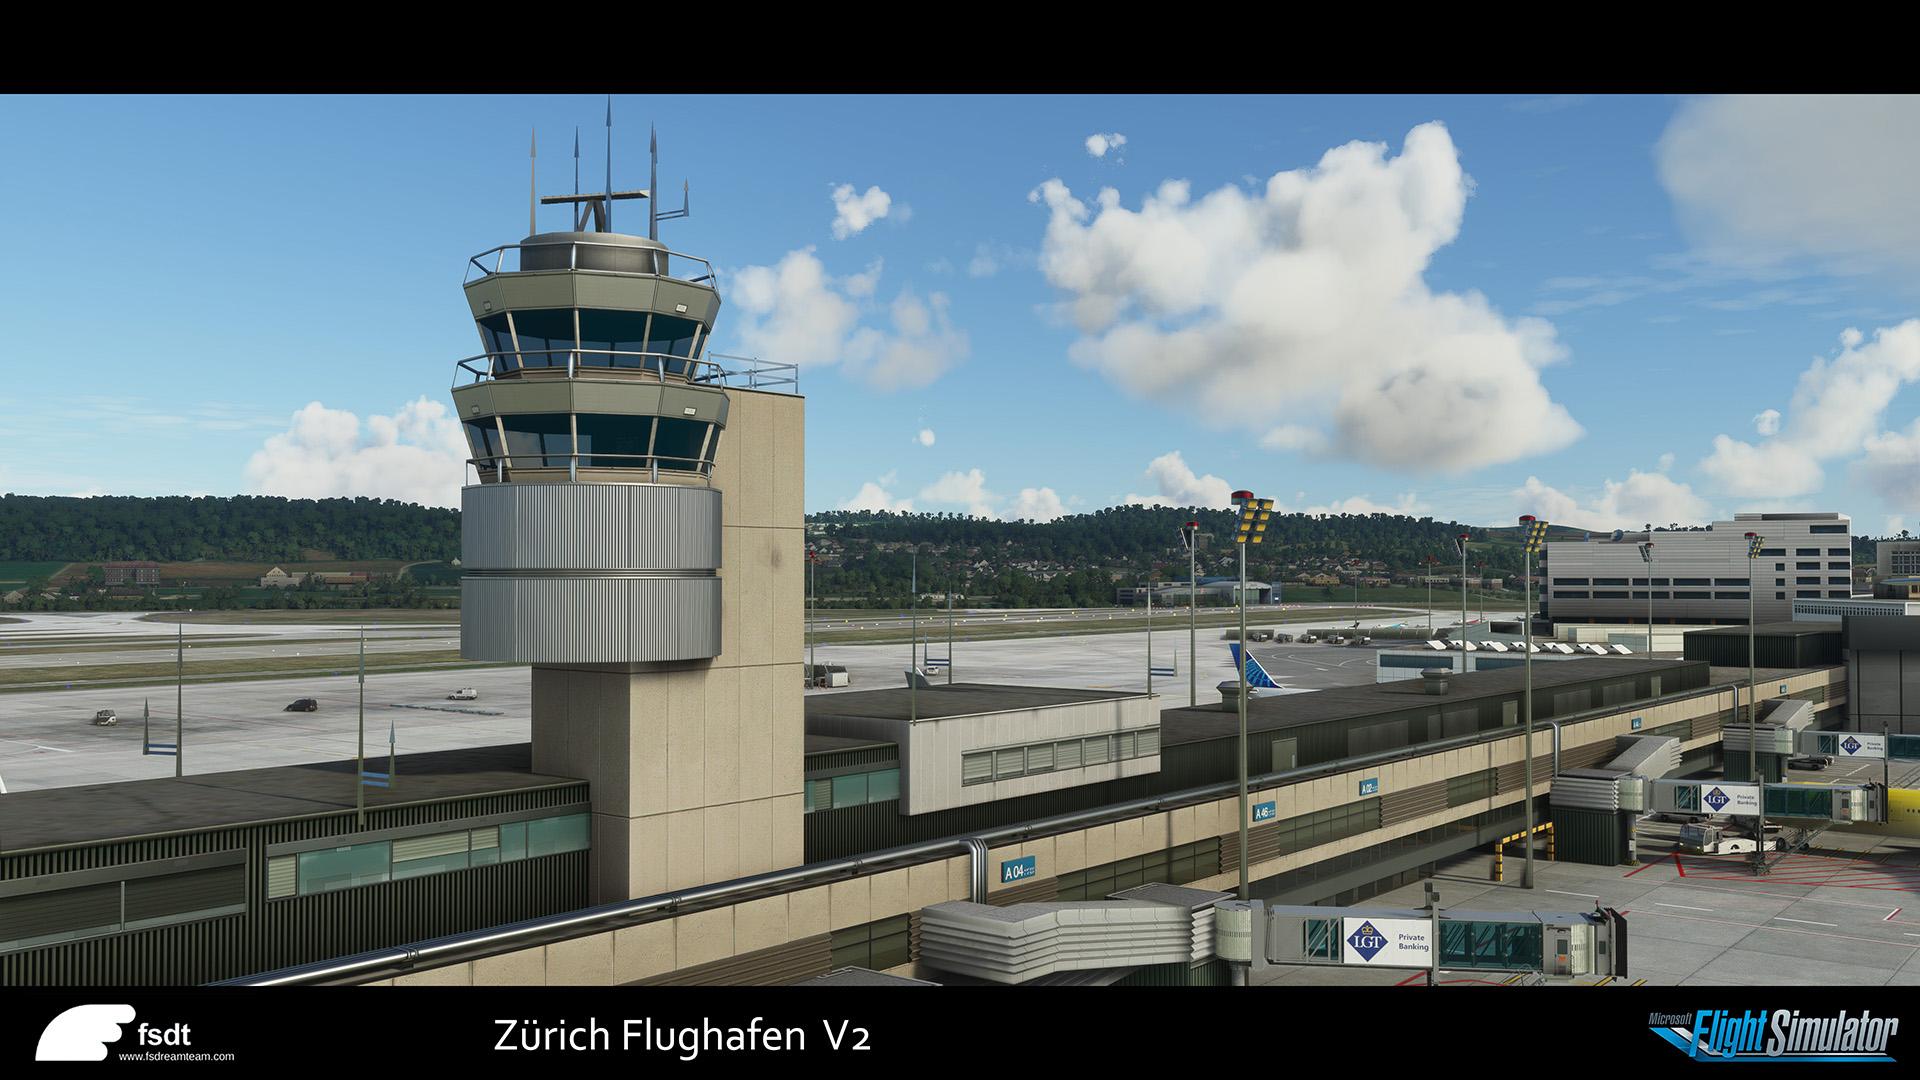 Zurich for flight simulator 2020